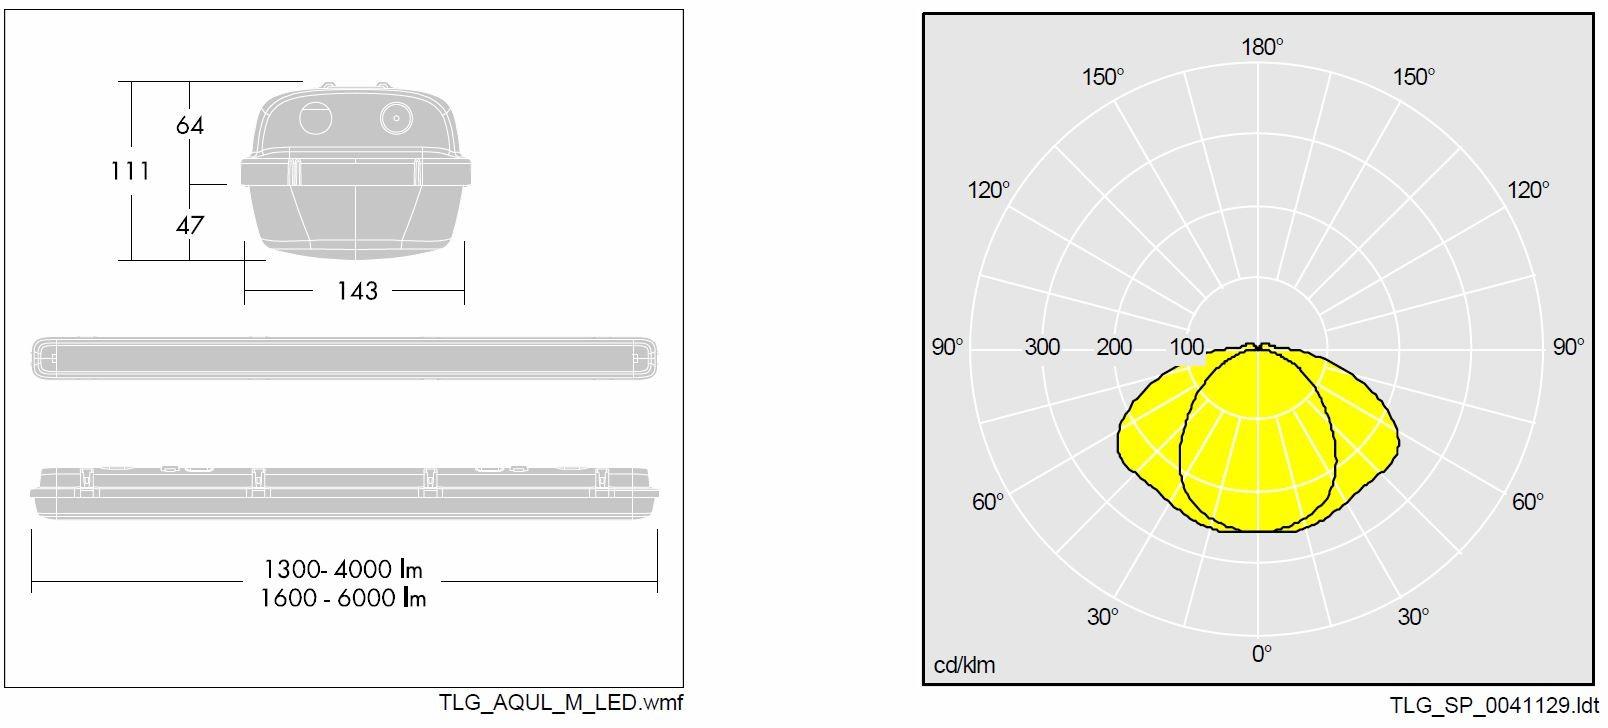 hight resolution of thorn aquaforce ii led waterproof 4000k 4300lm ip65